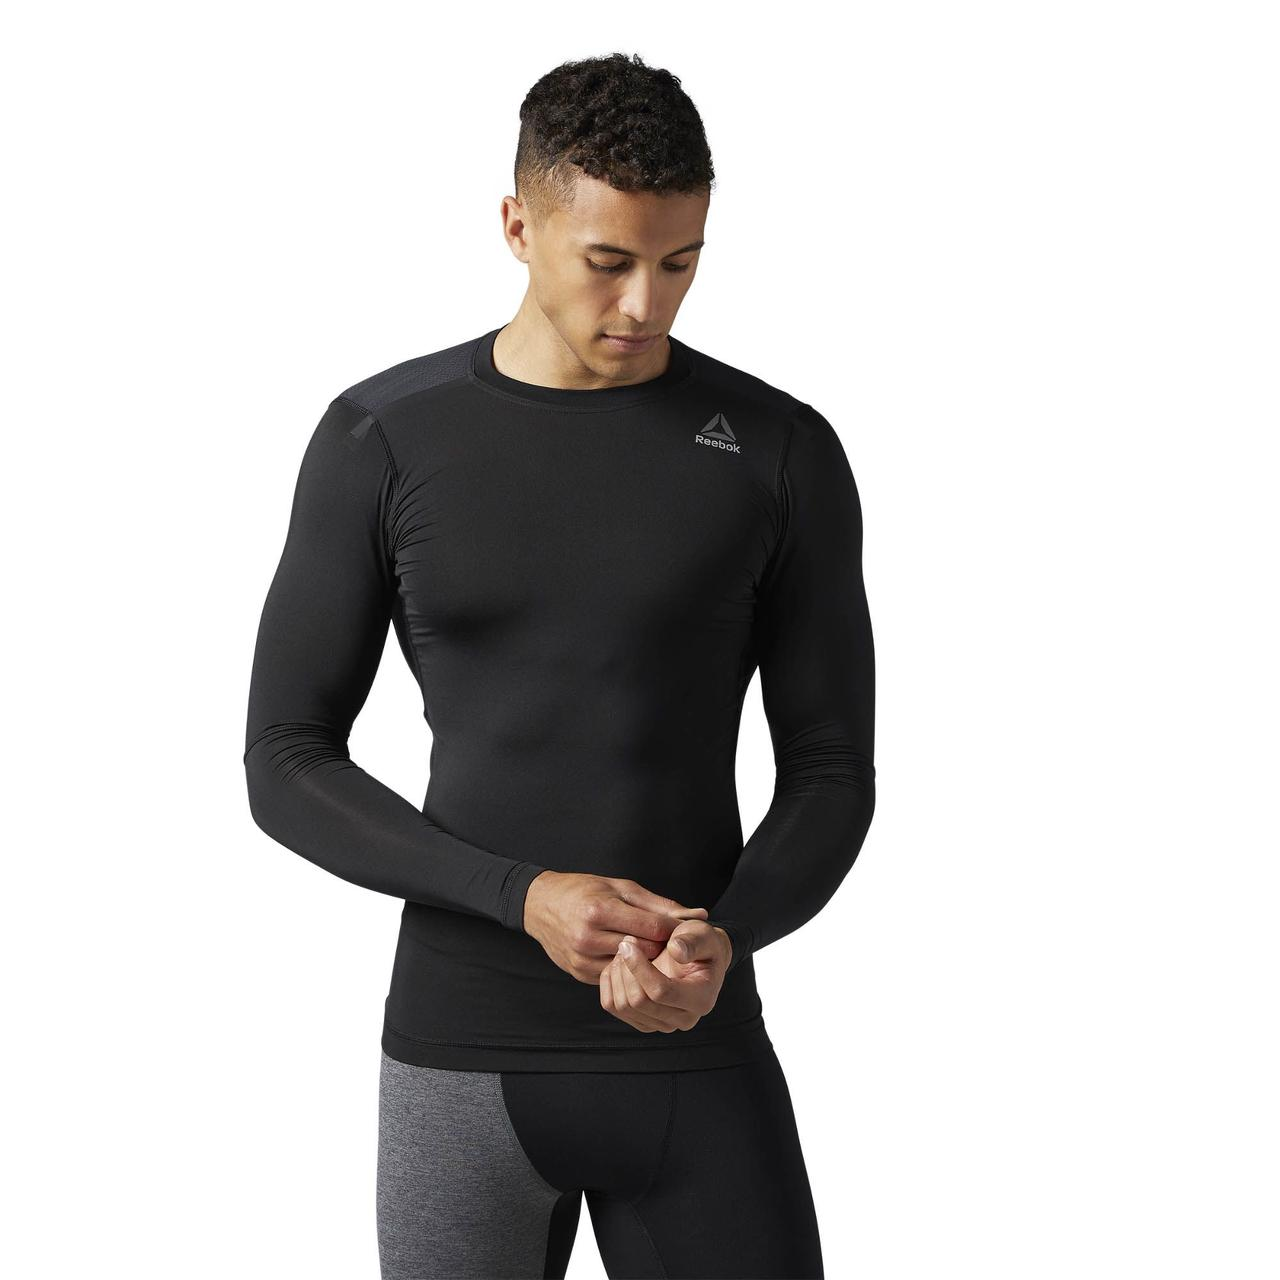 Мужская футболка Reebok Activchill (Артикул: BR9575)